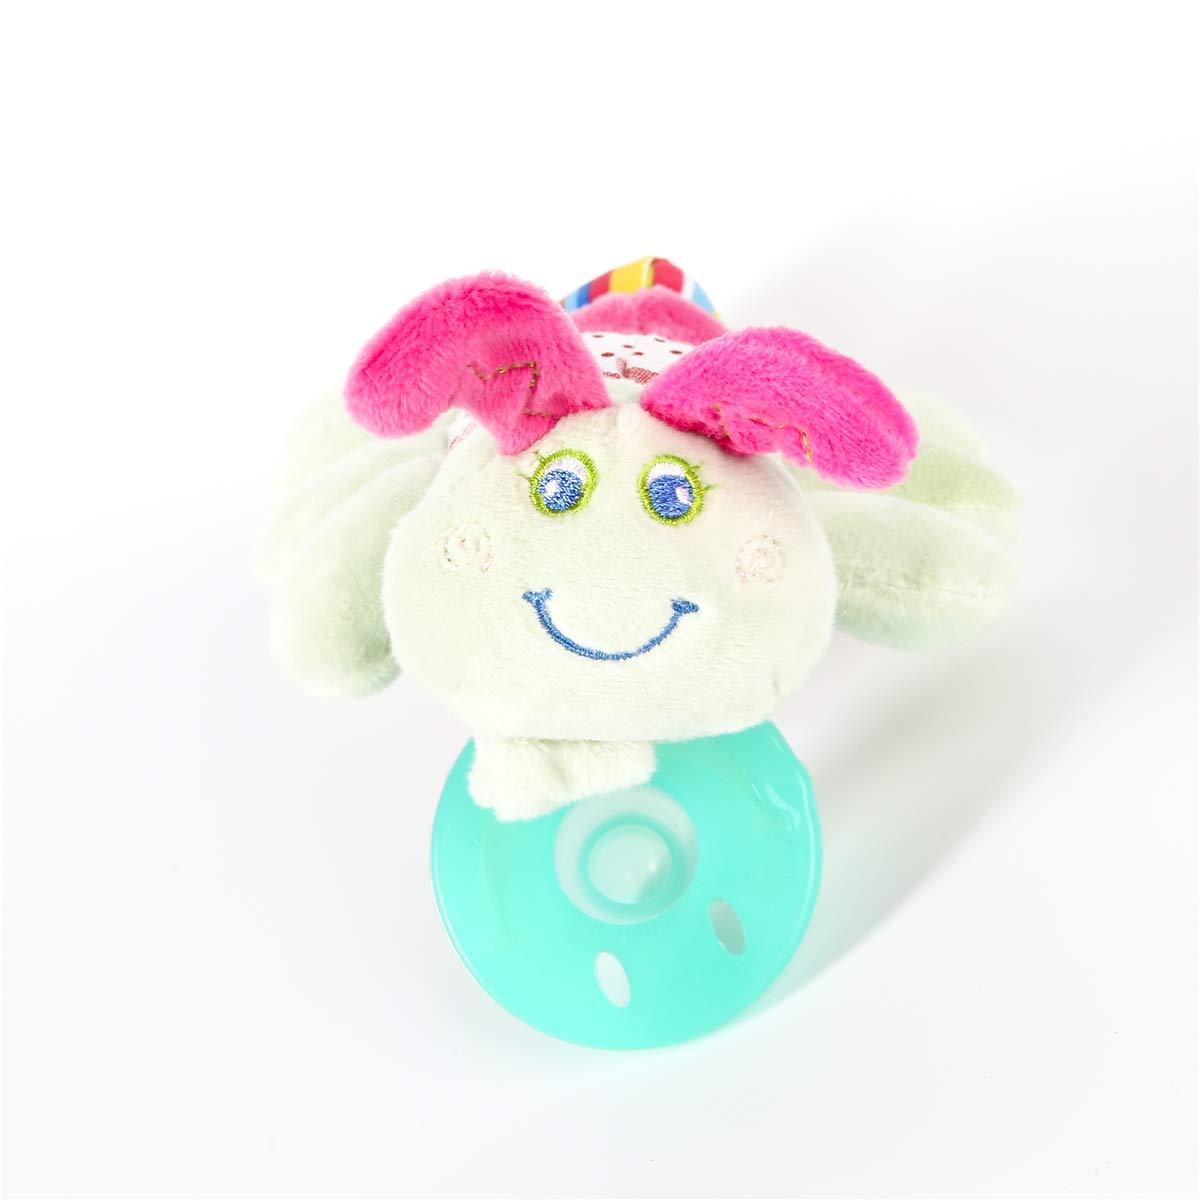 Kahuorey - Chupete para bebé recién nacido de silicona ...